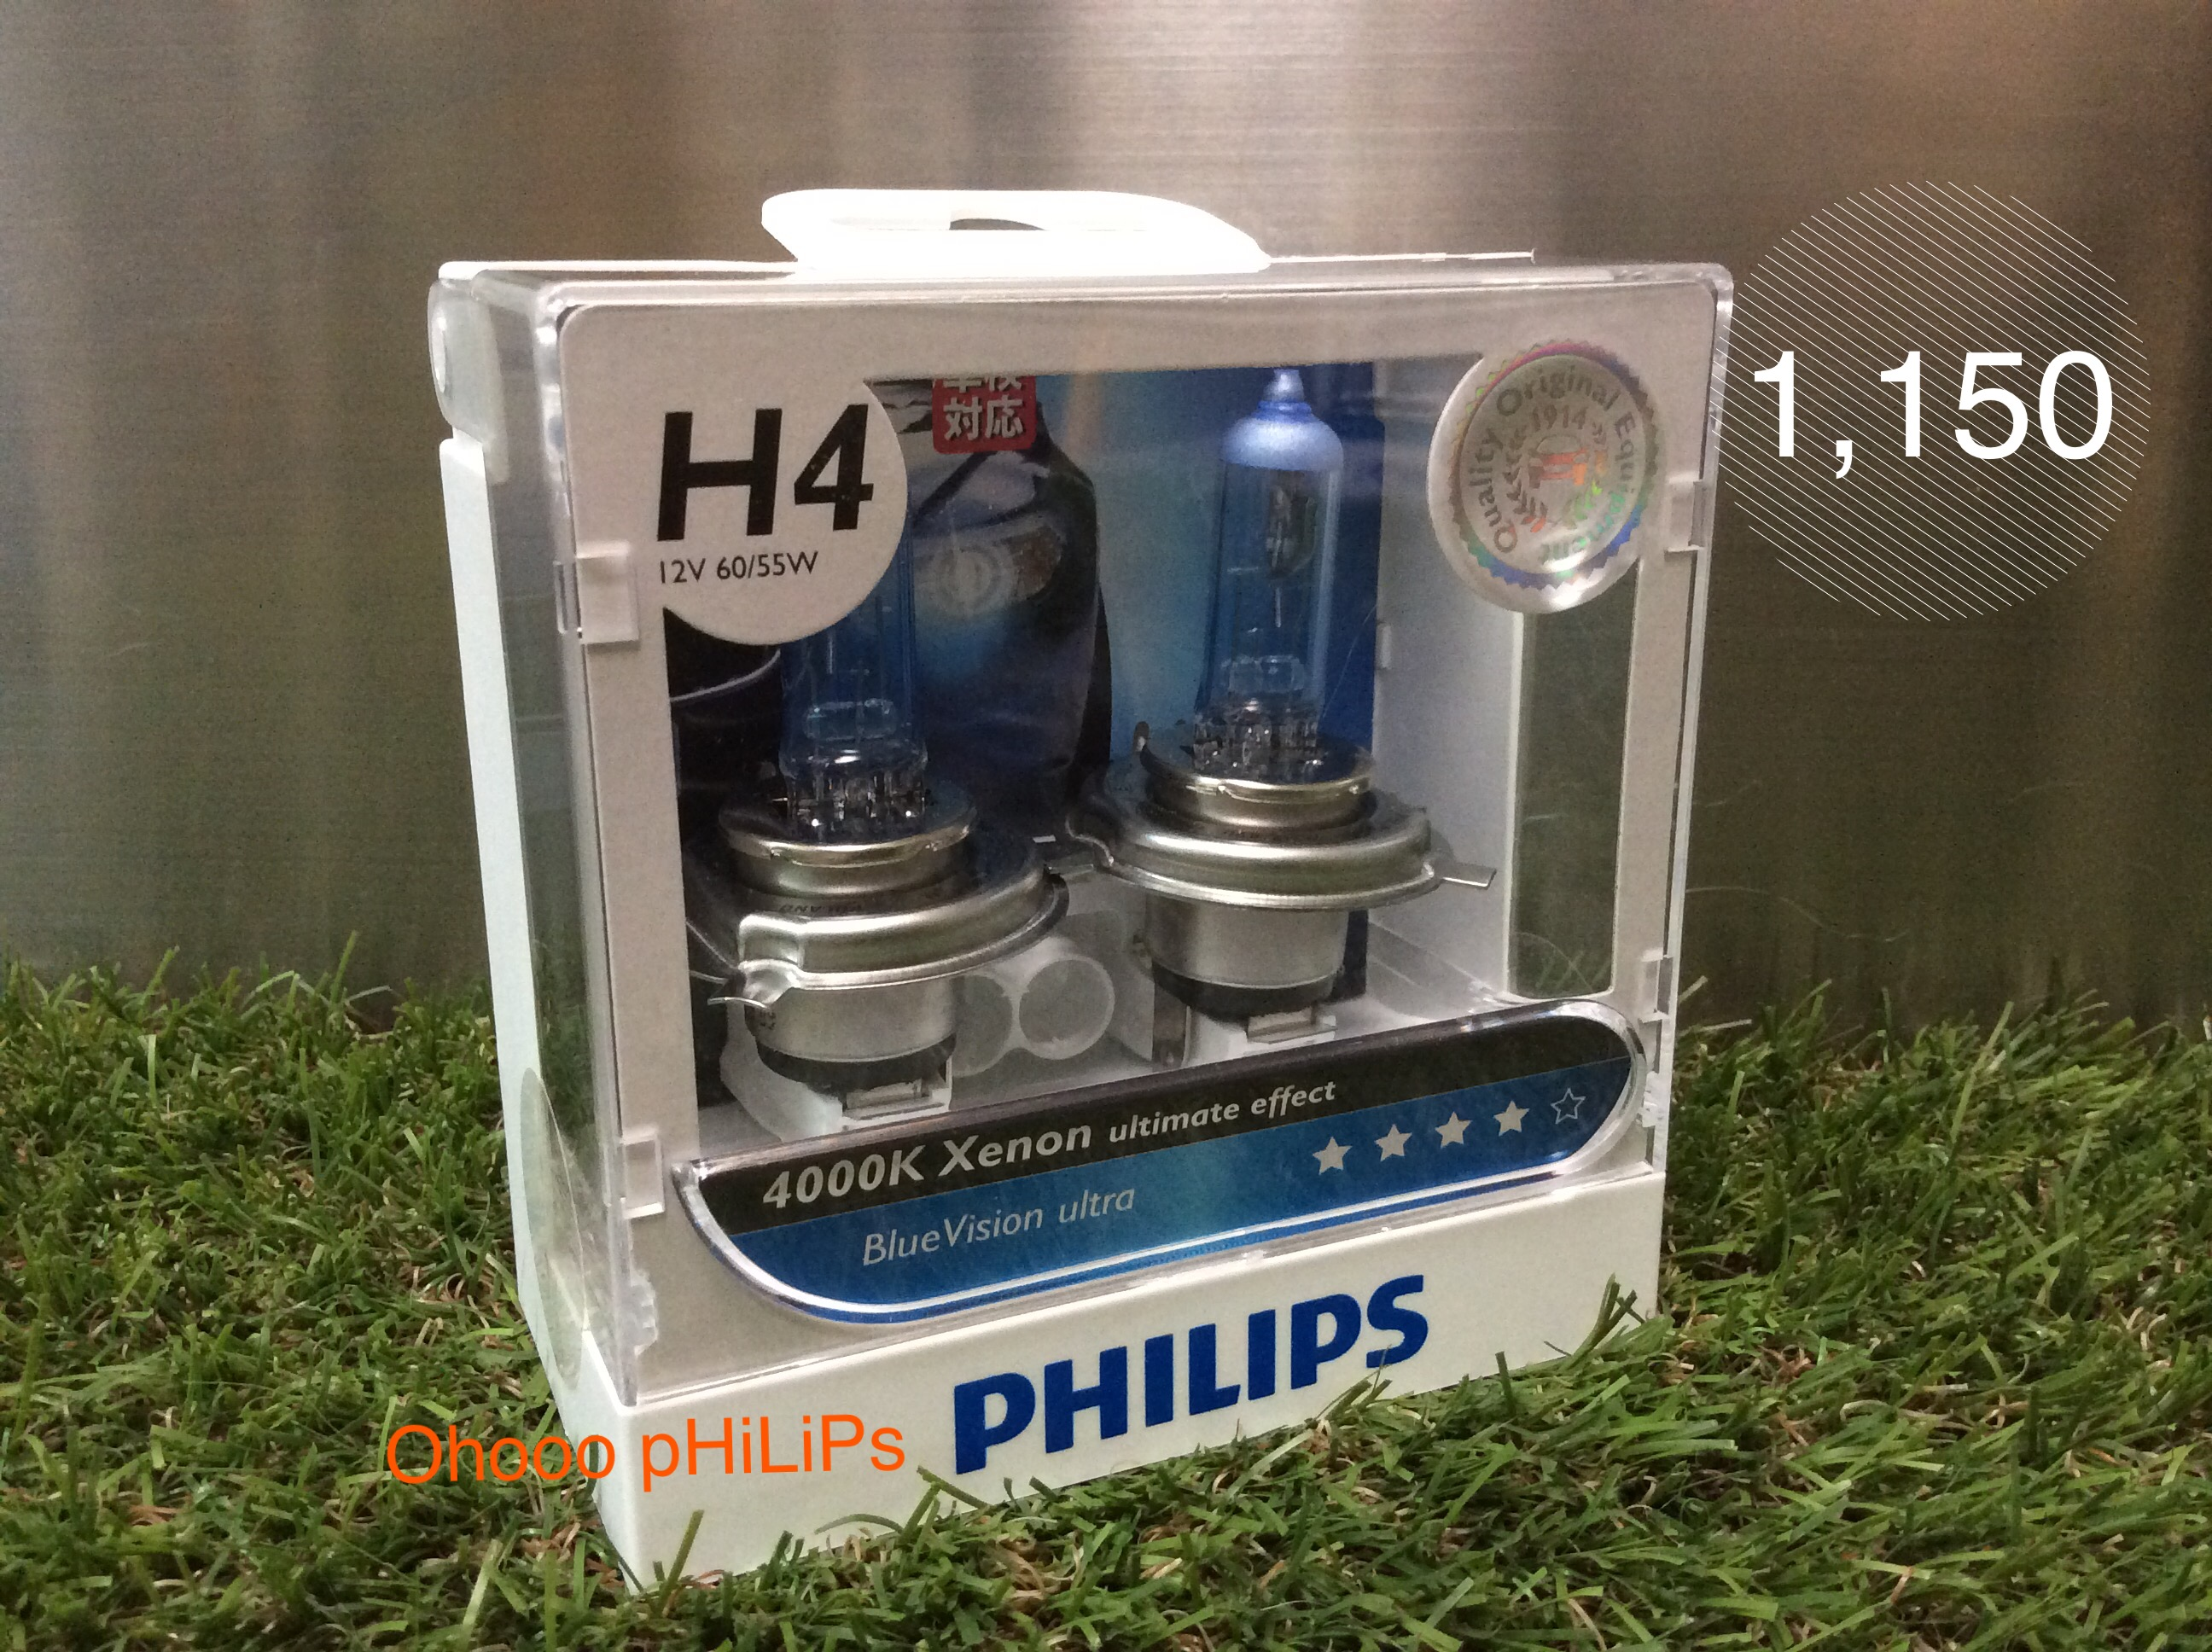 Philips Blue Vision 4000K H4